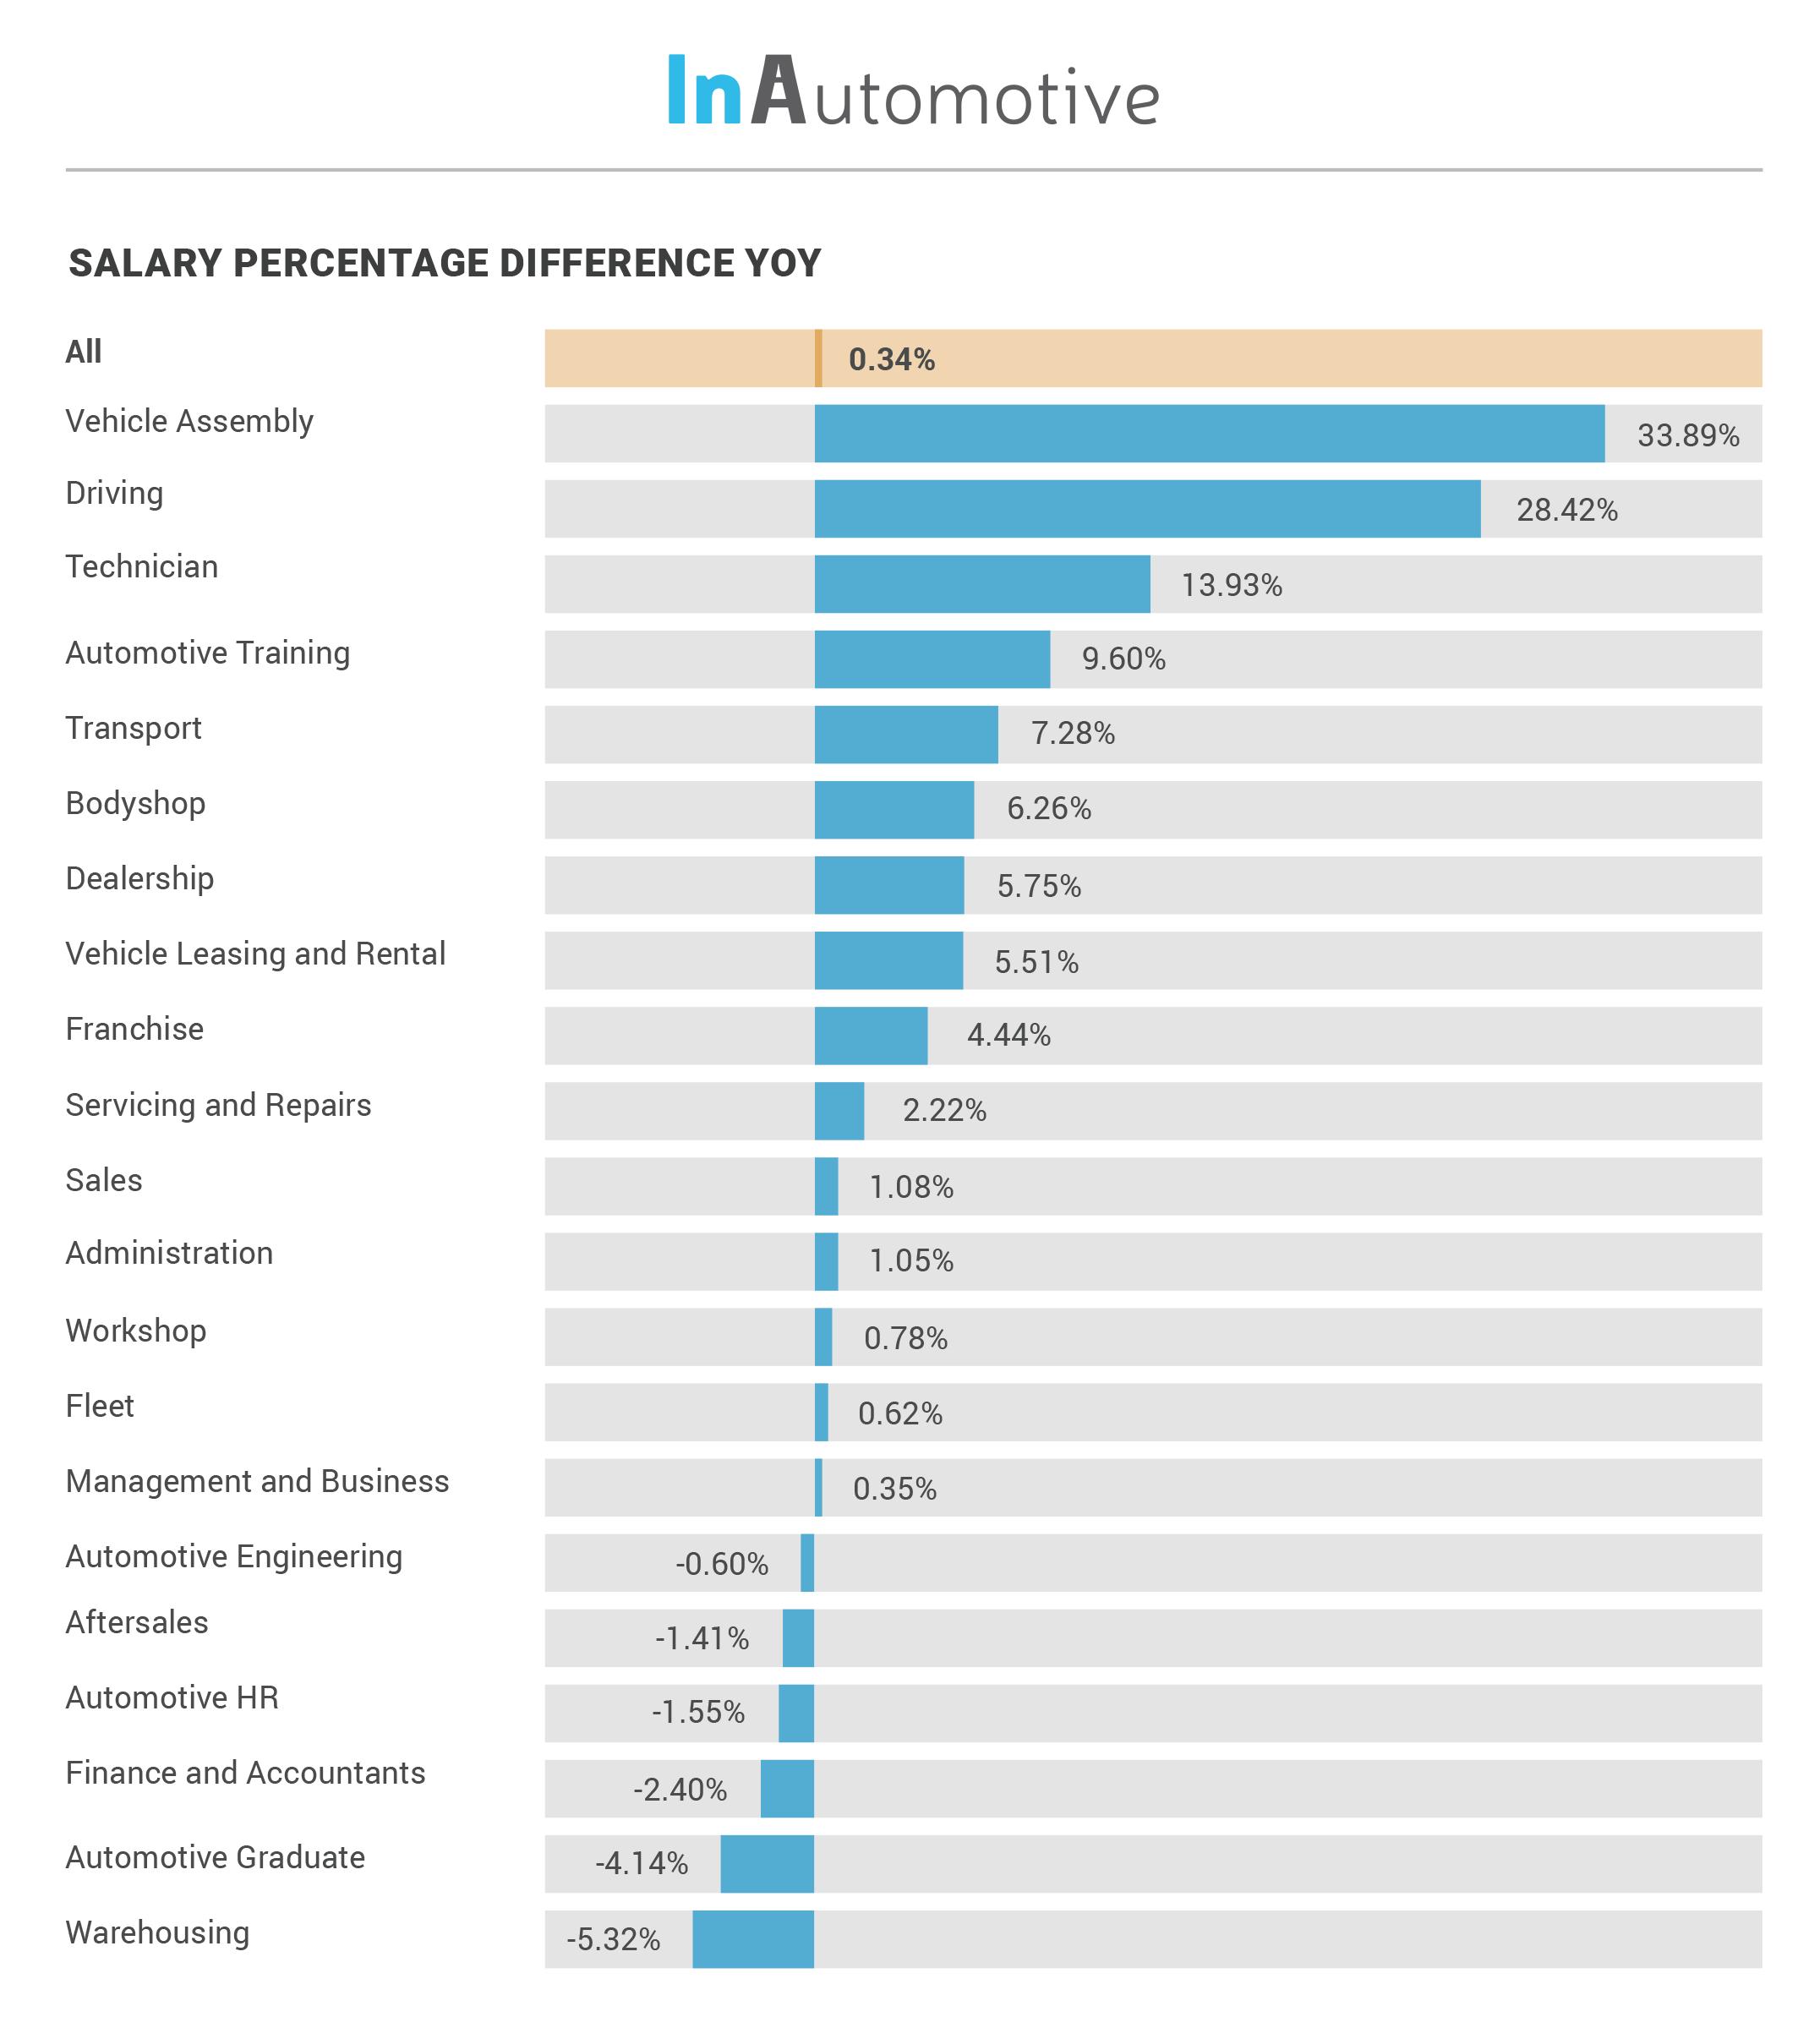 InAutomotive Salary